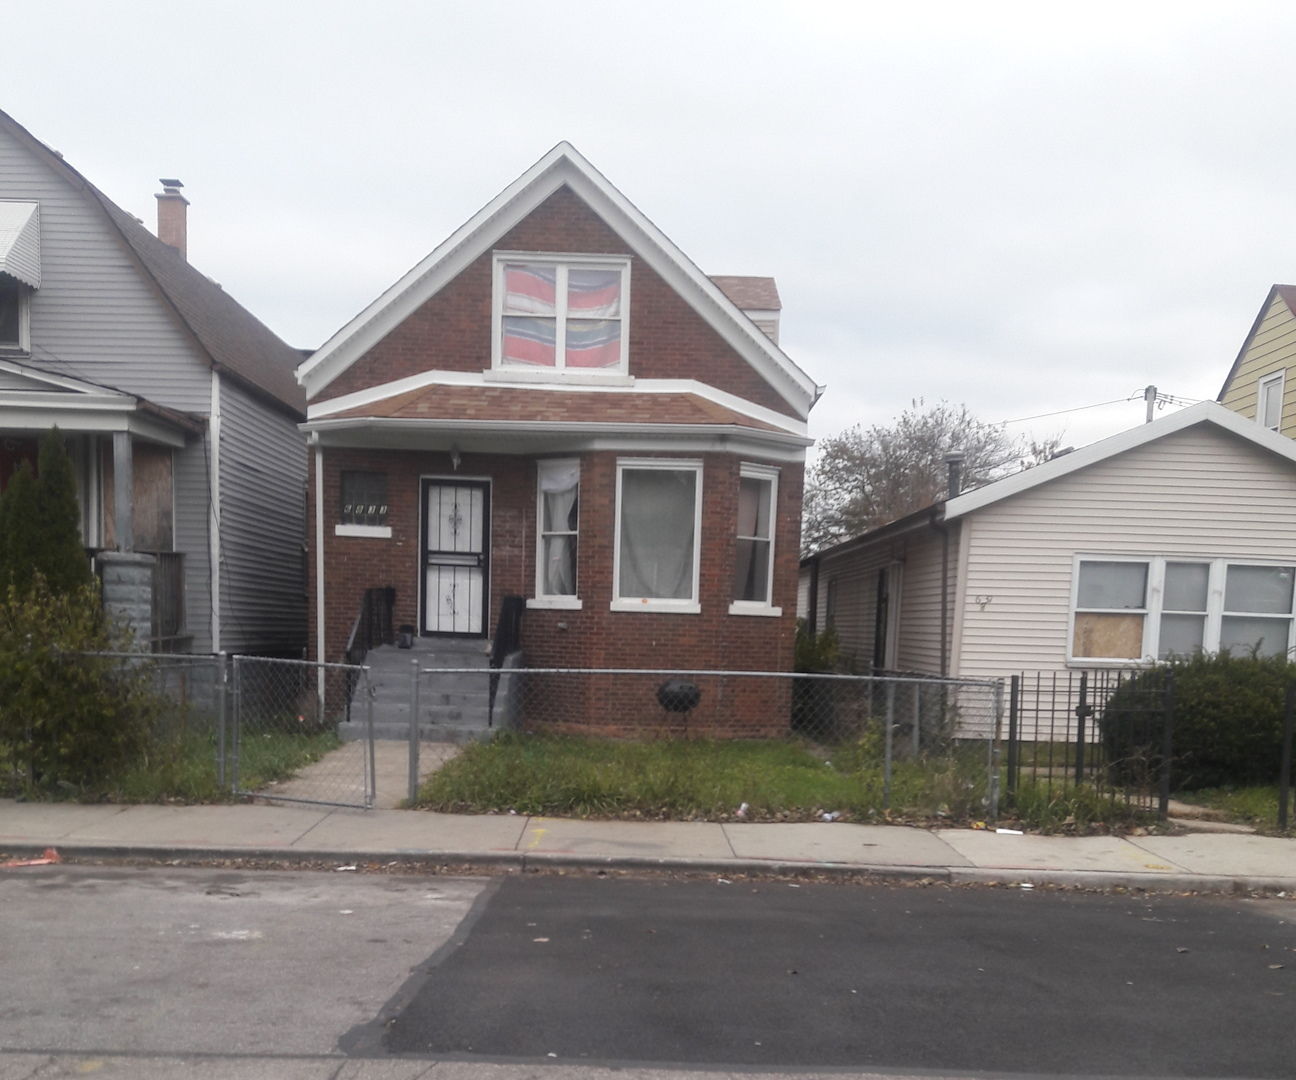 6833 SOUTH ABERDEEN STREET, CHICAGO, IL 60621